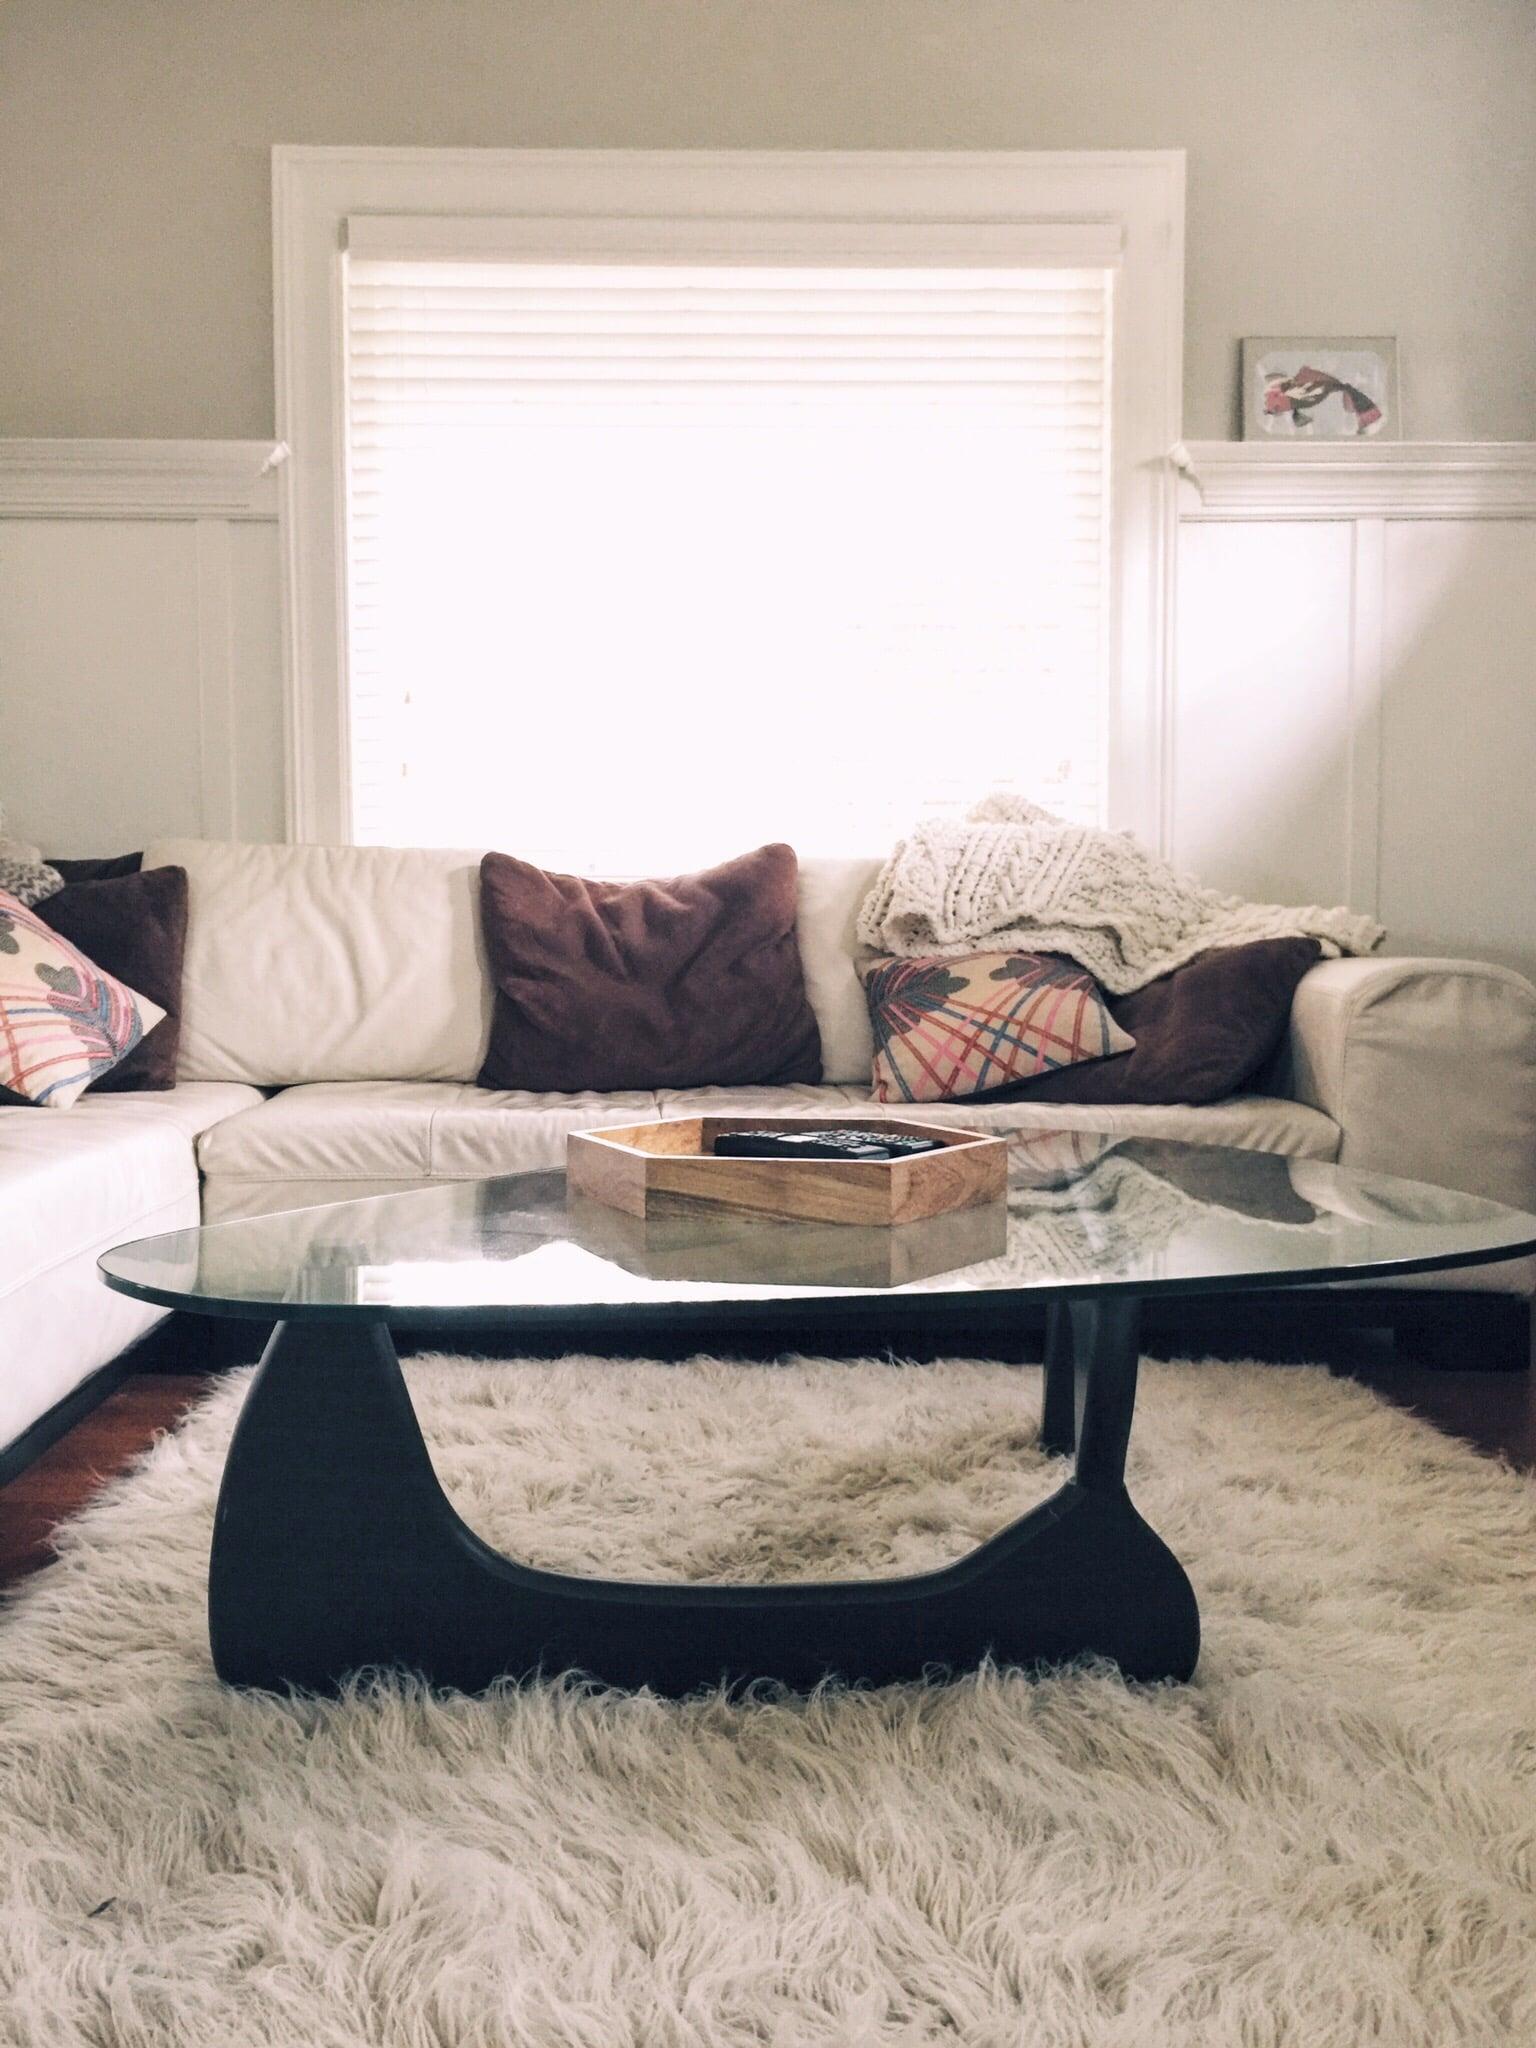 Shag rug and unassuming glamour.